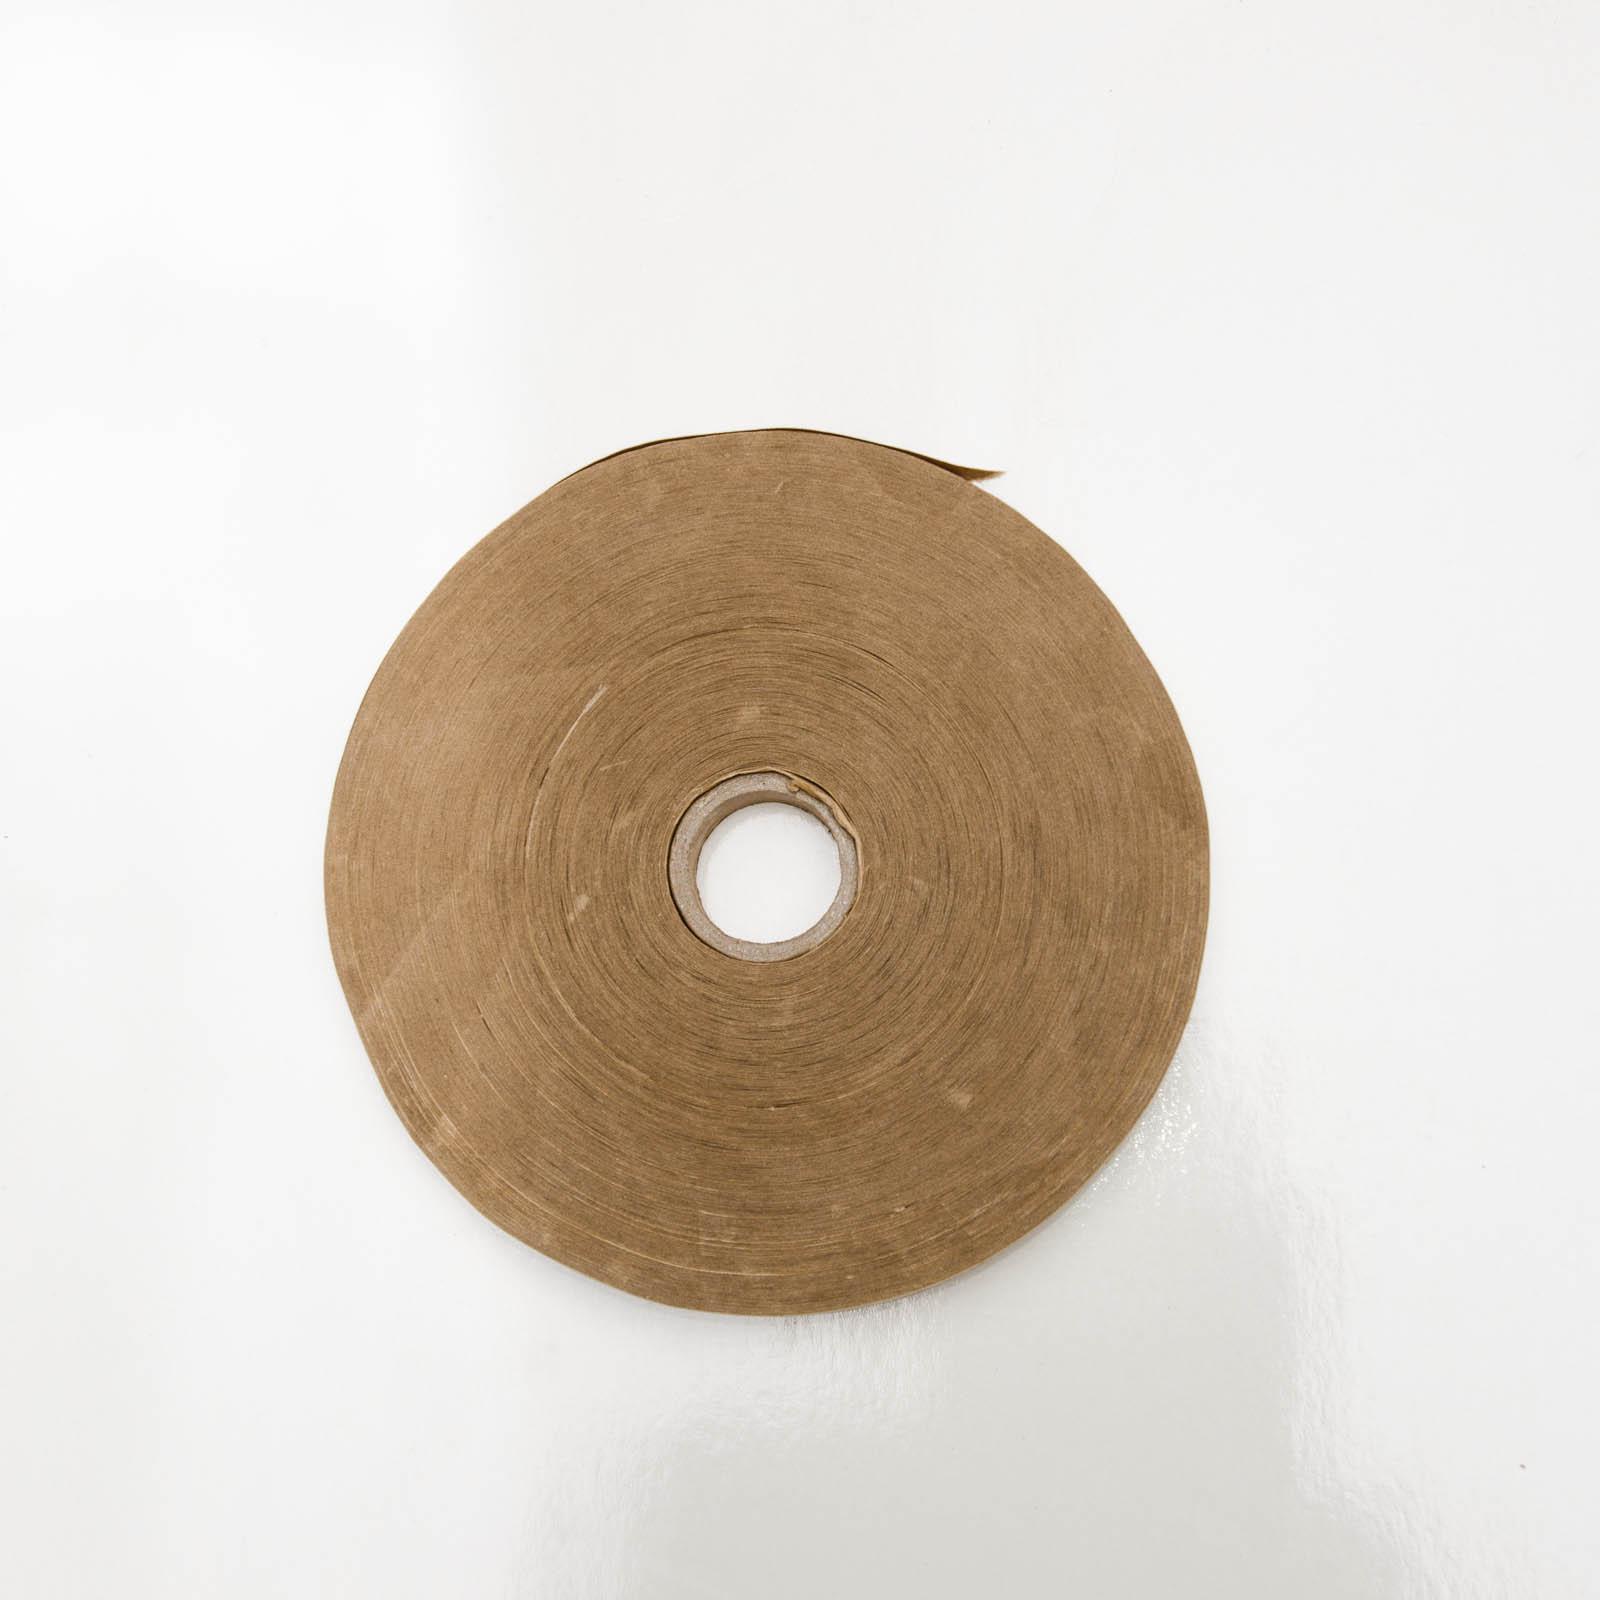 5 Rolls Veneer tape 20mm x 200m